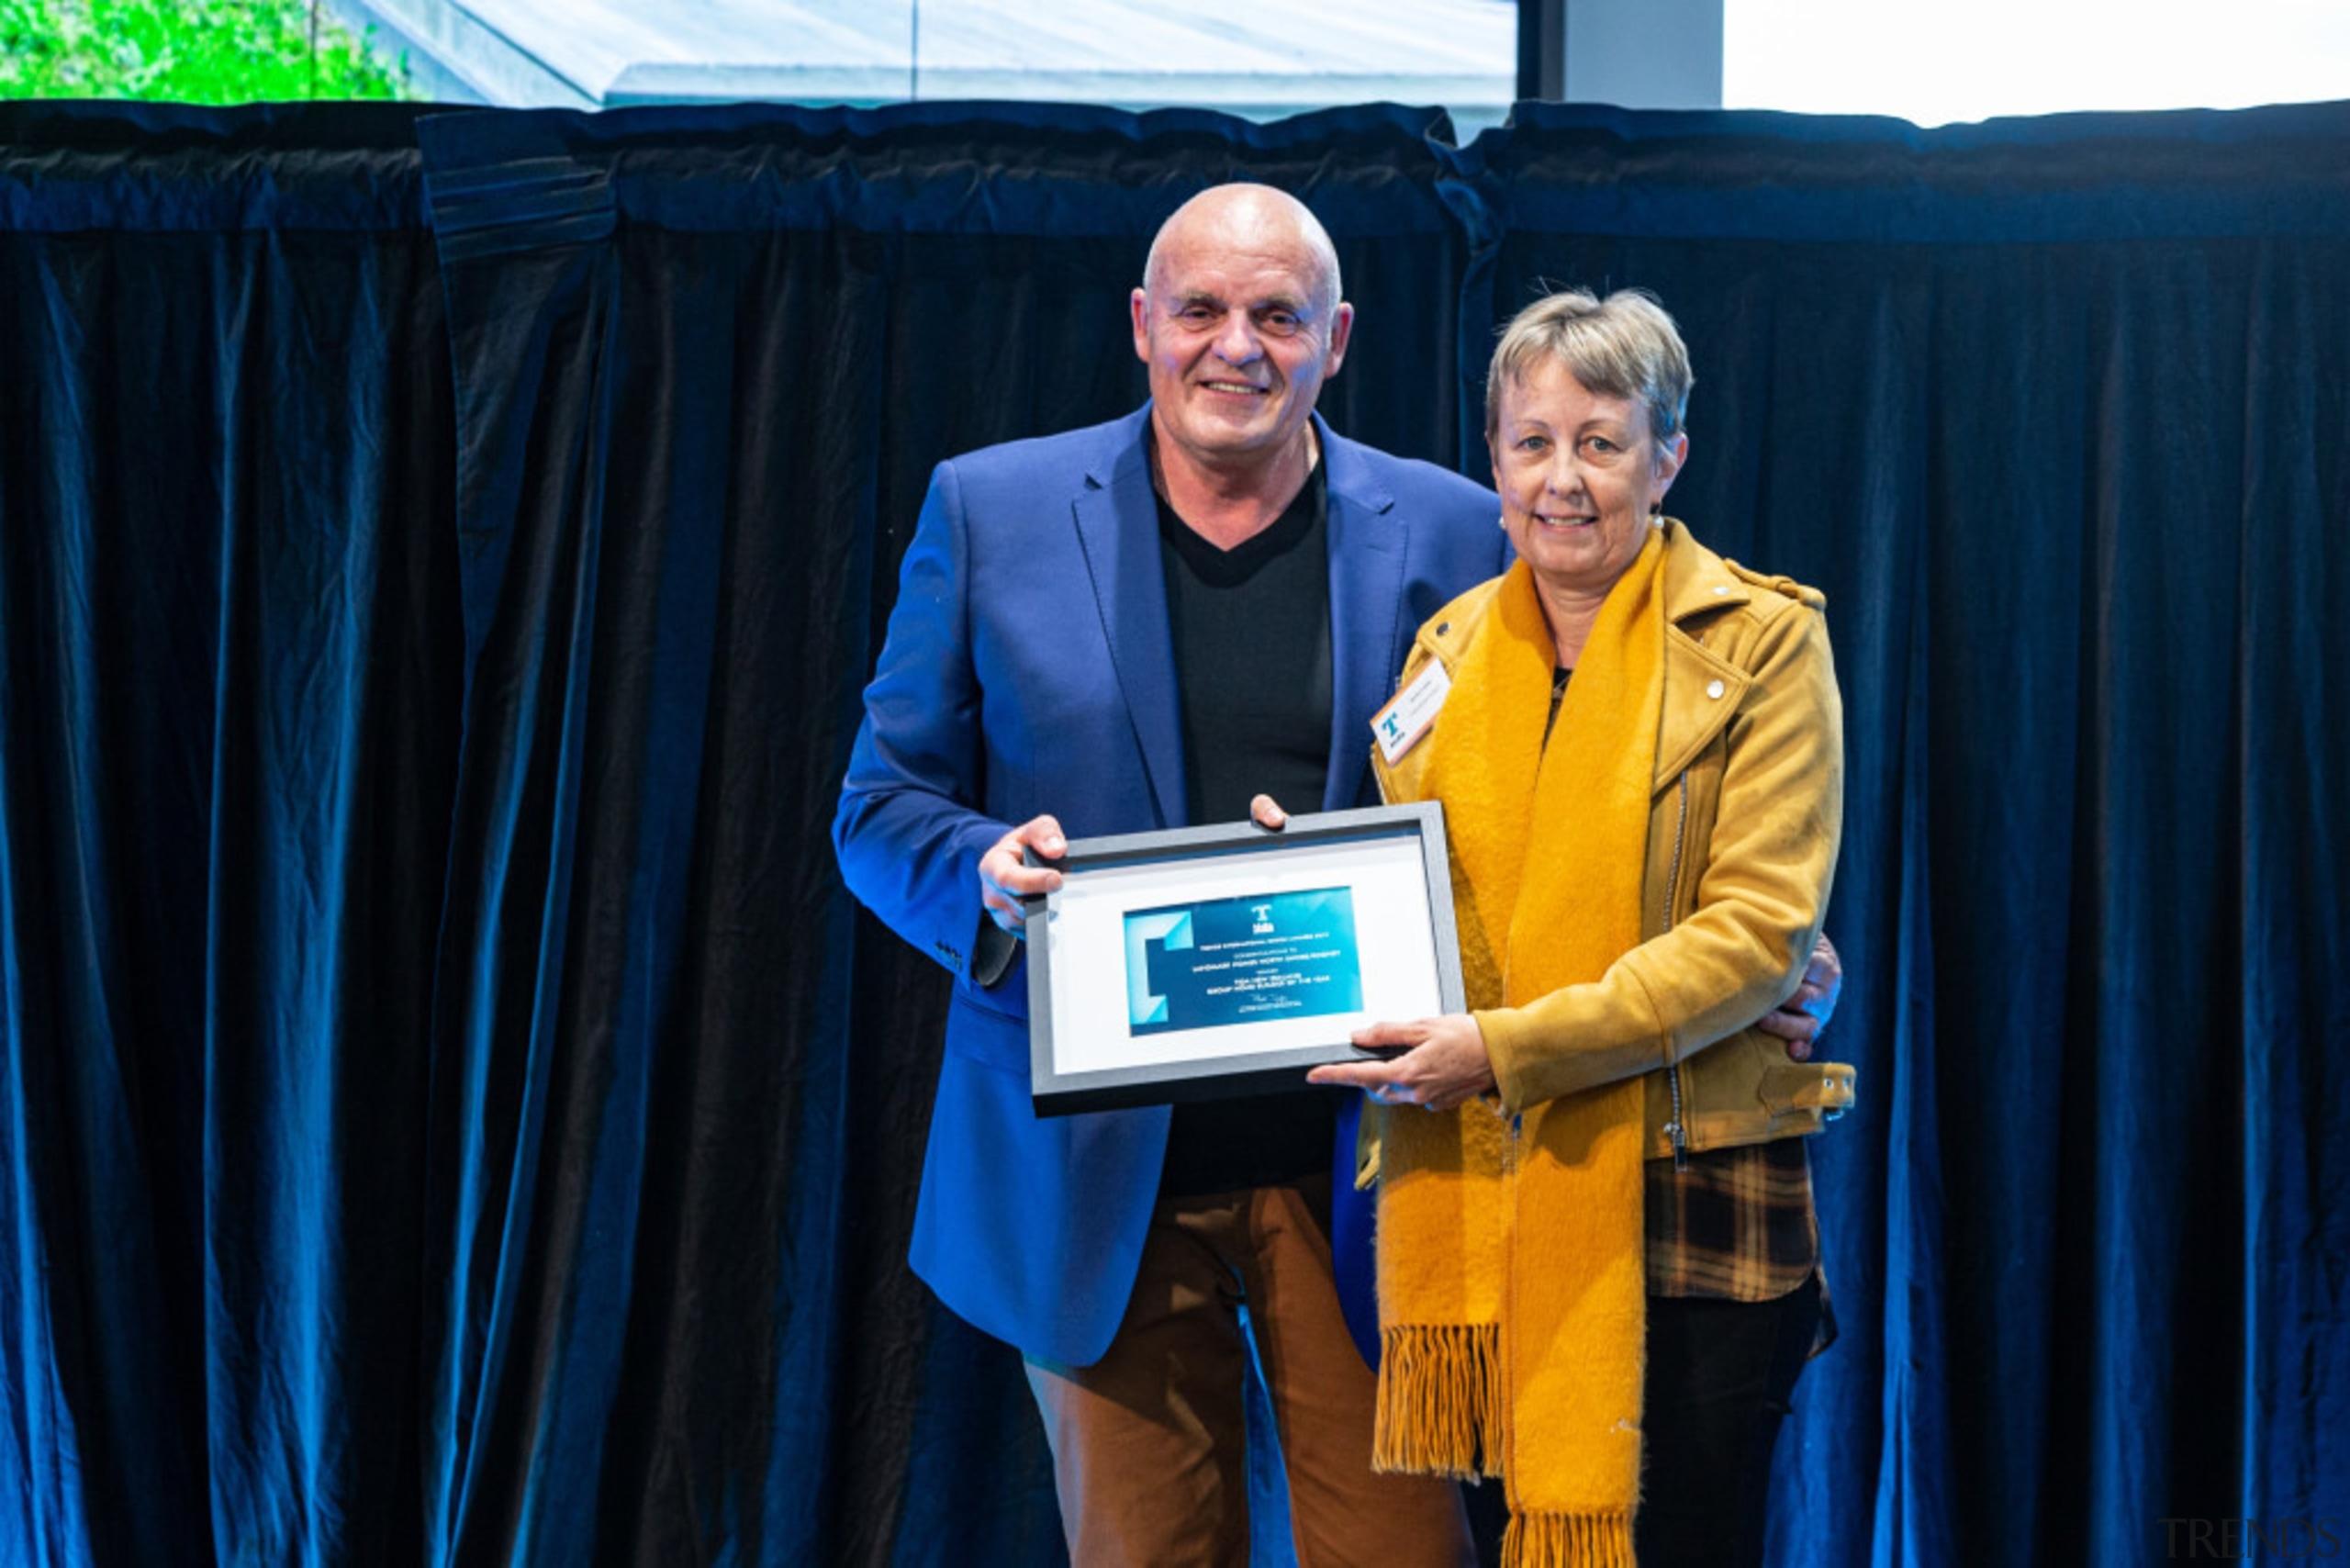 2019 TIDA New Zealand Homes presentation evening award, award ceremony, event, yellow, blue